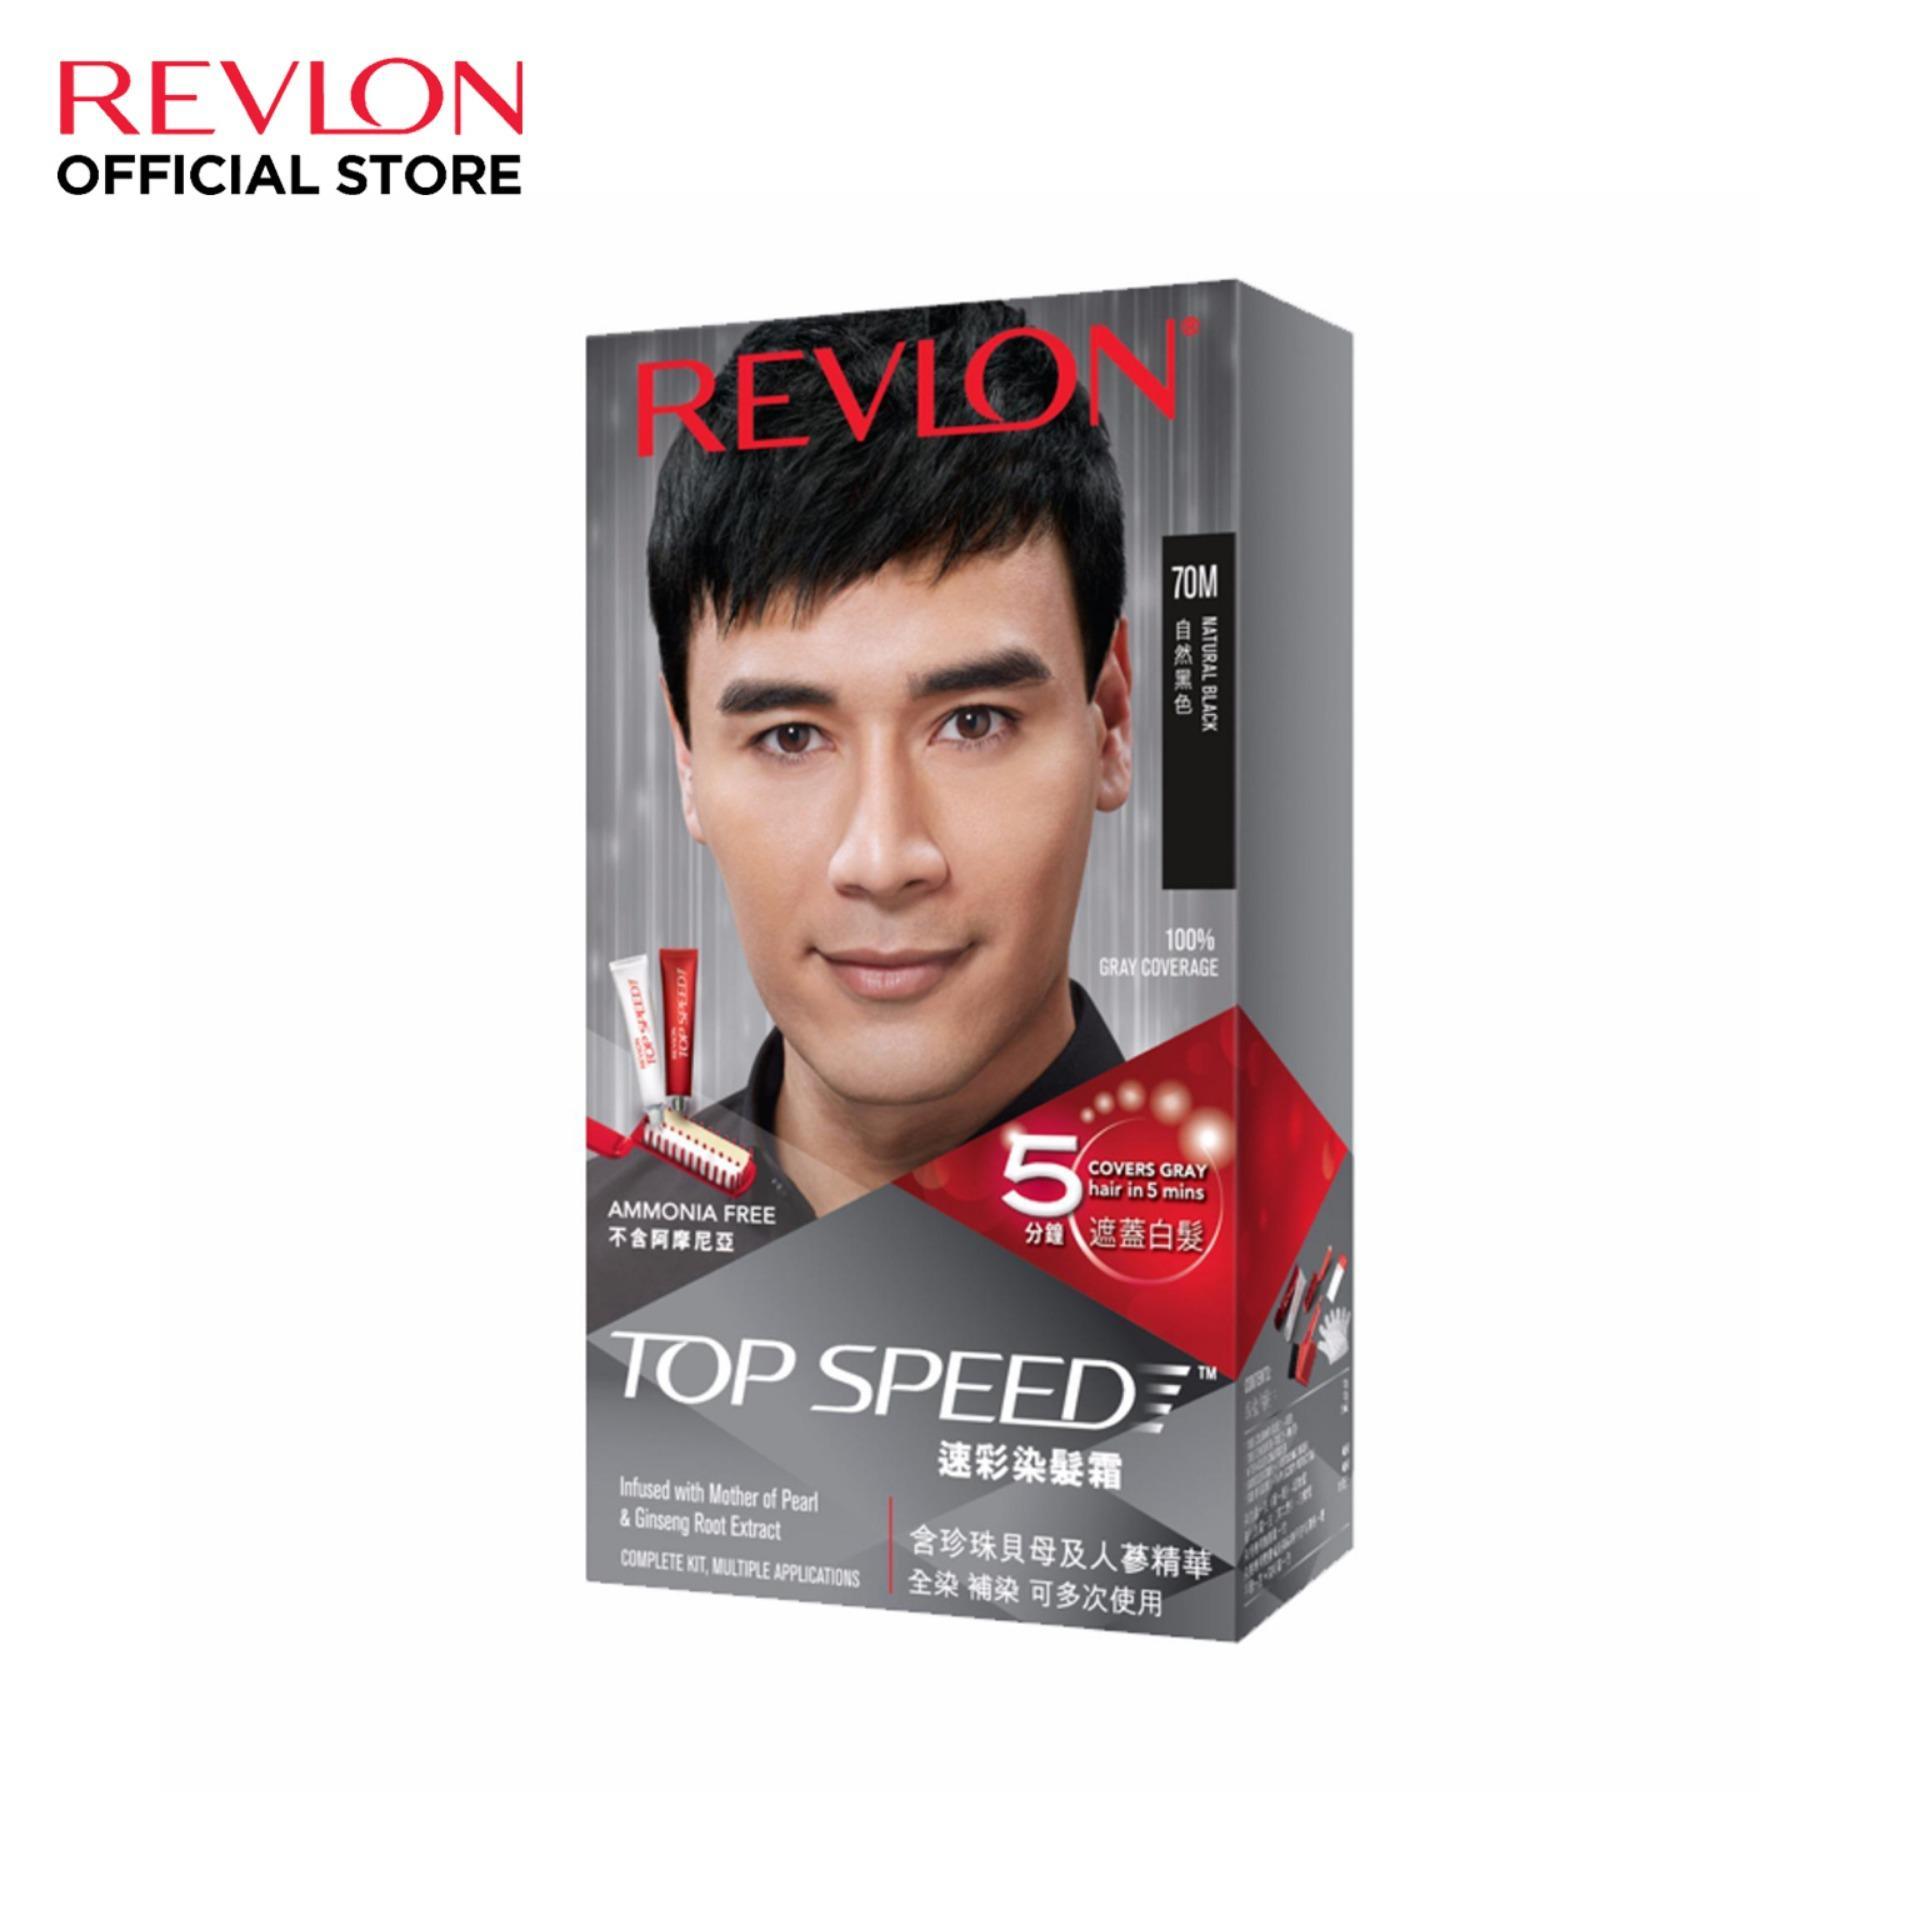 Revlon Top Speed Hair Color 70M Natural Black New Packaging